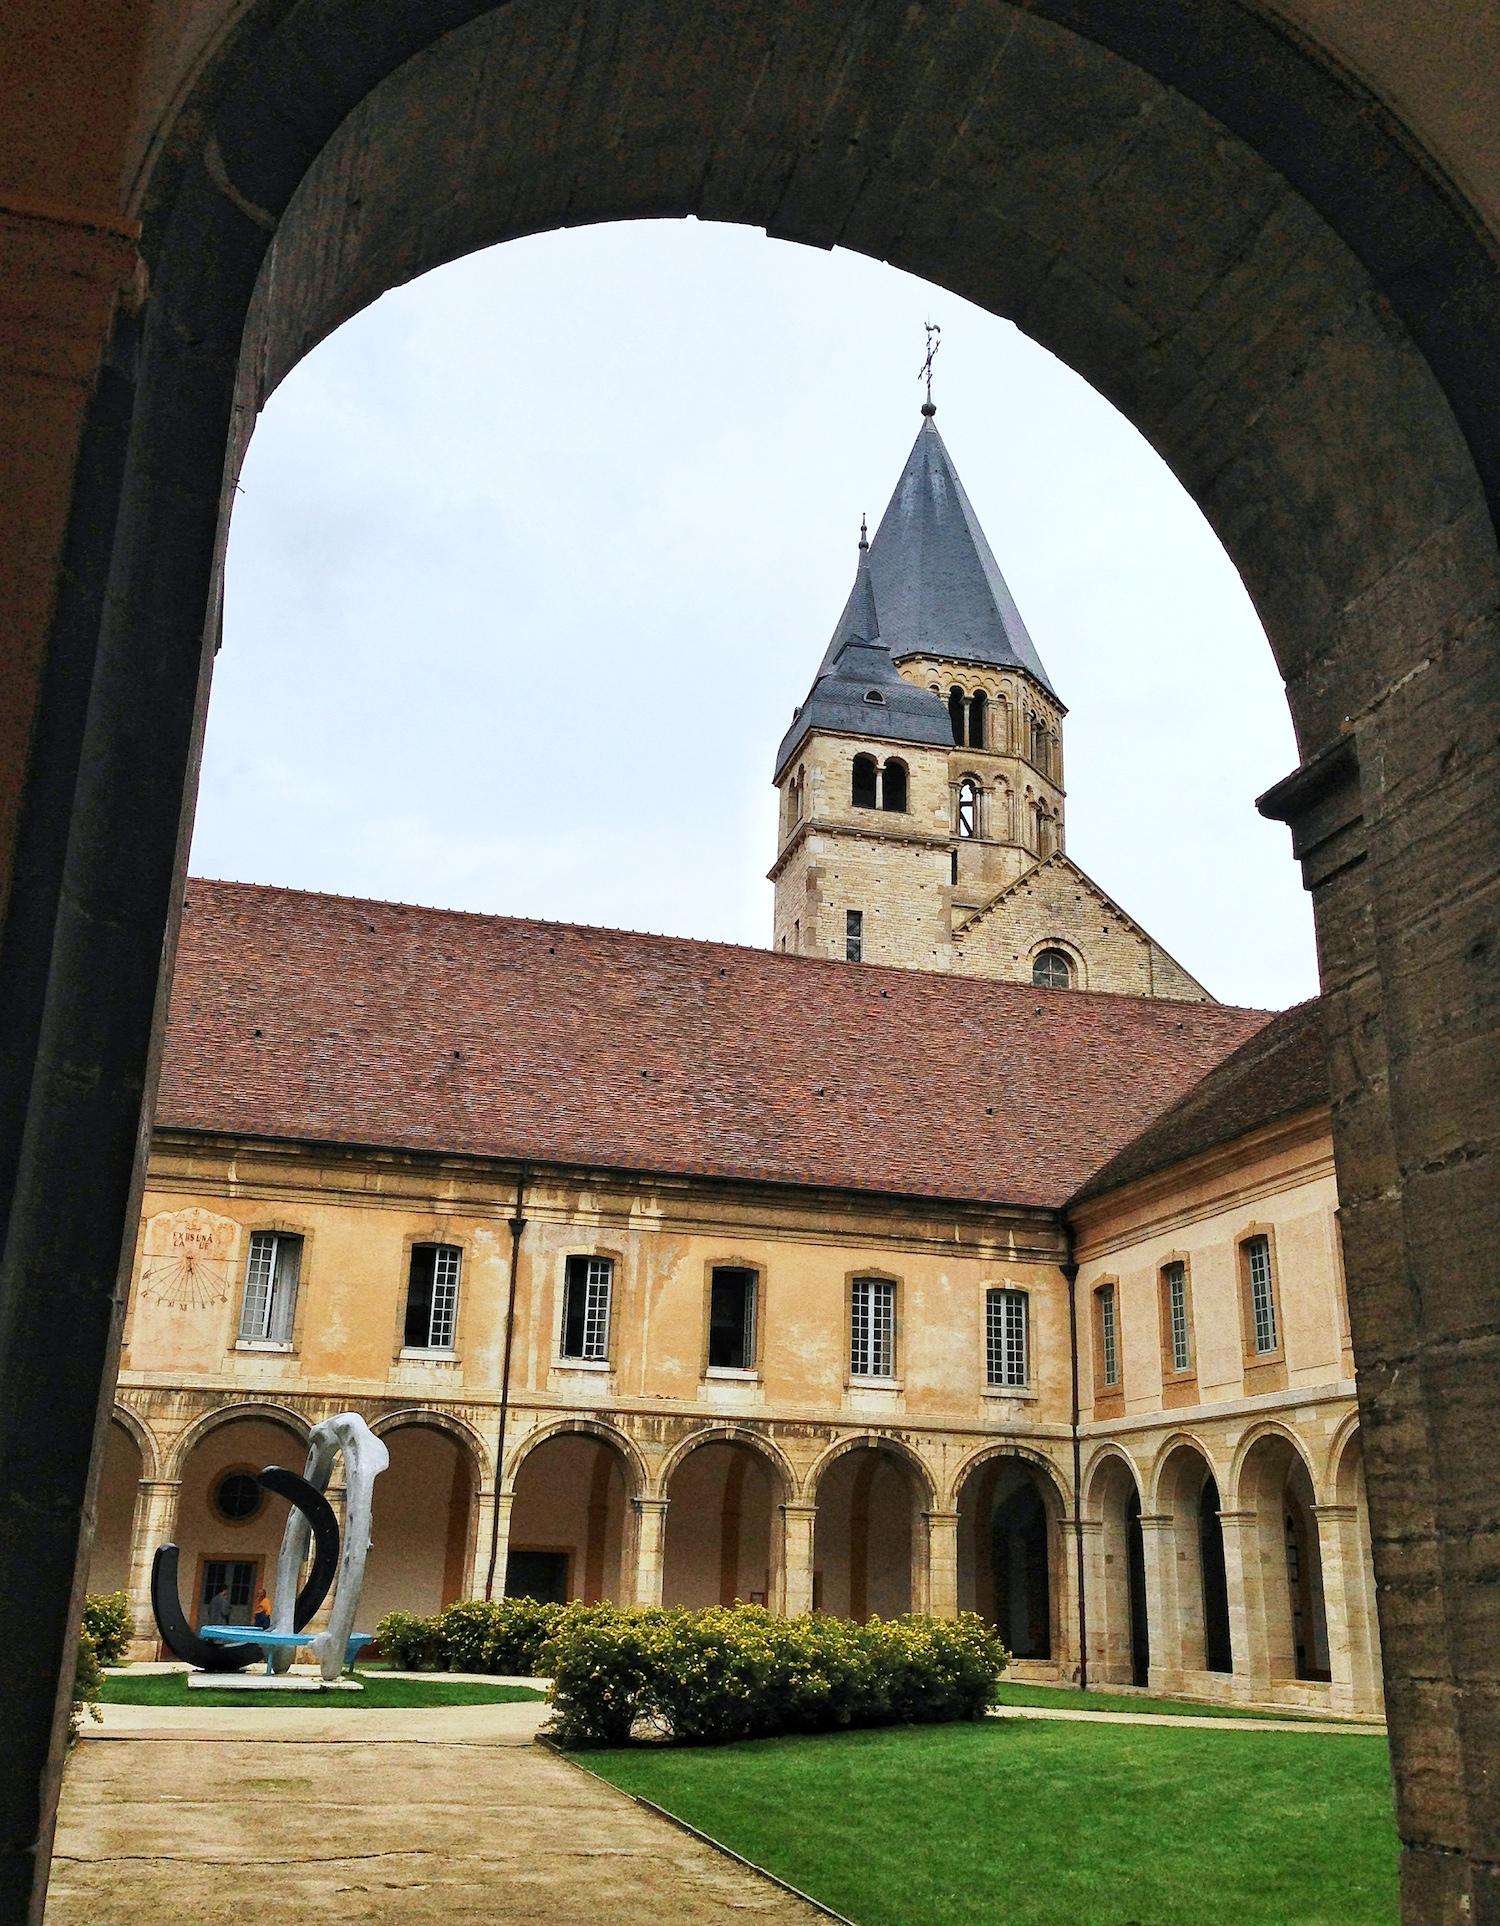 Cluny France courtyard.jpg